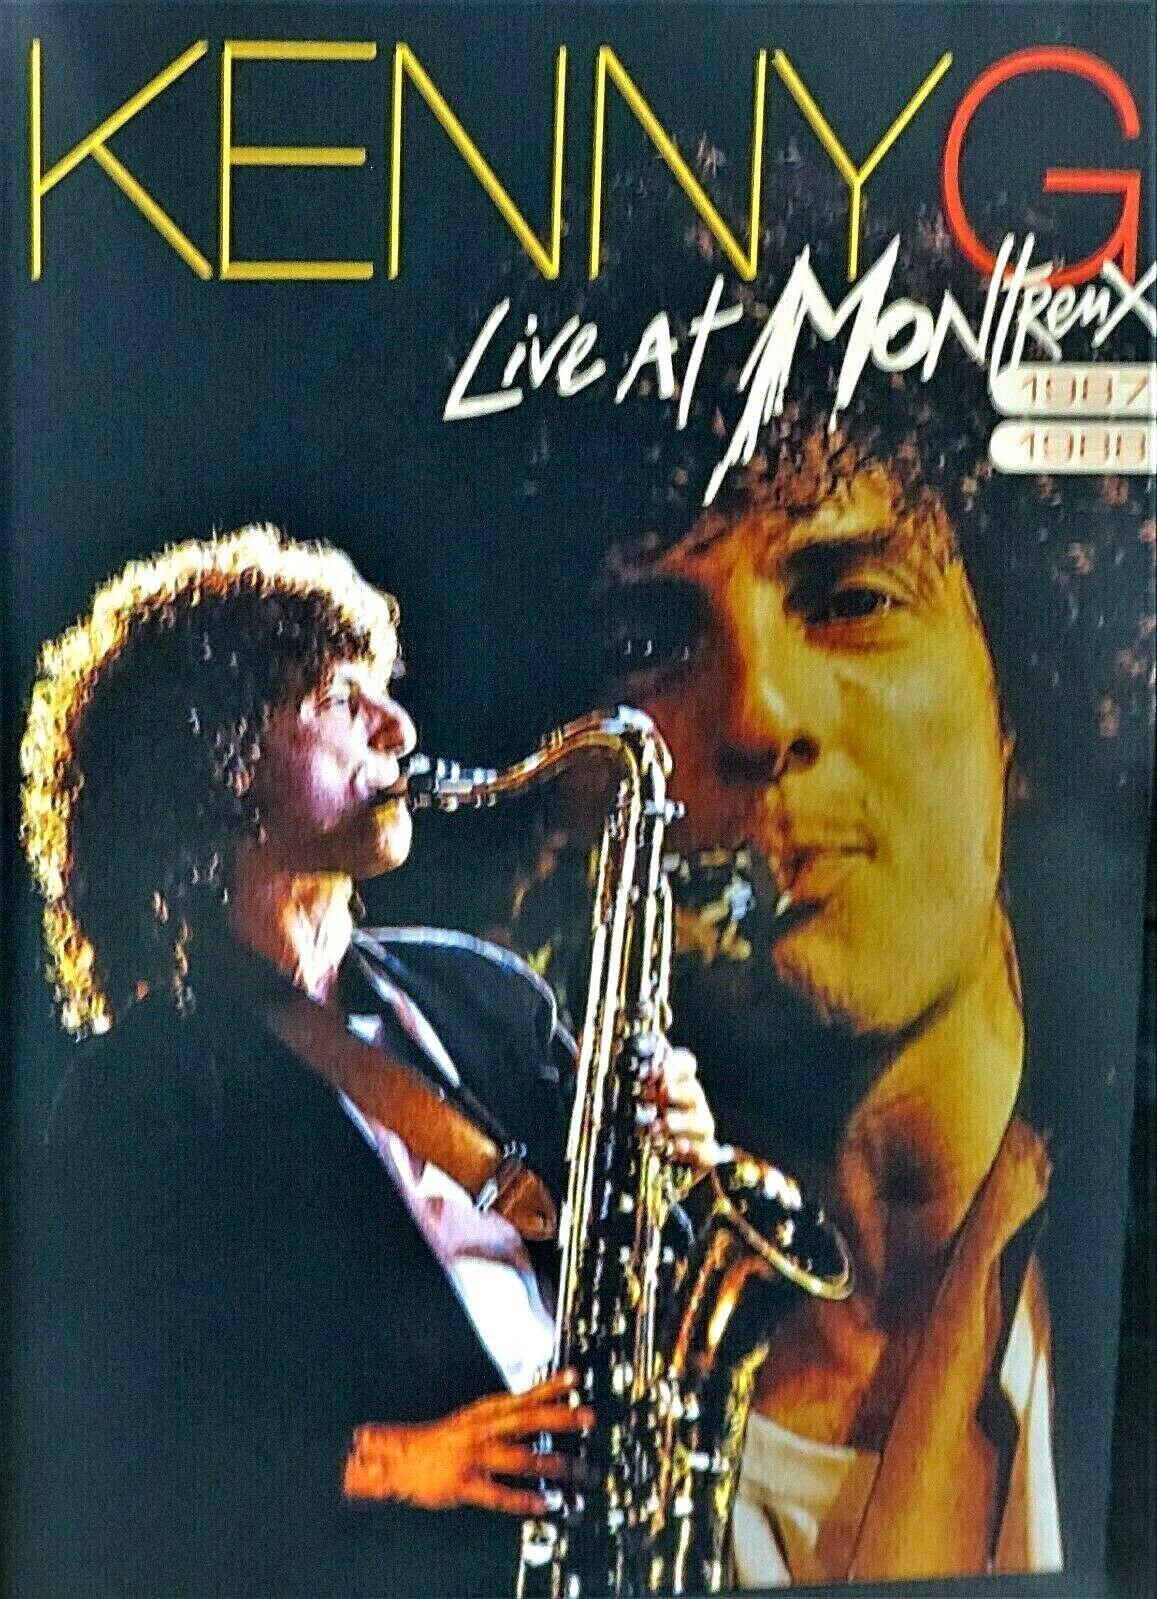 Kenny G Live Concert Montreux Jazz 1987,88 NEW! DVD,14 track